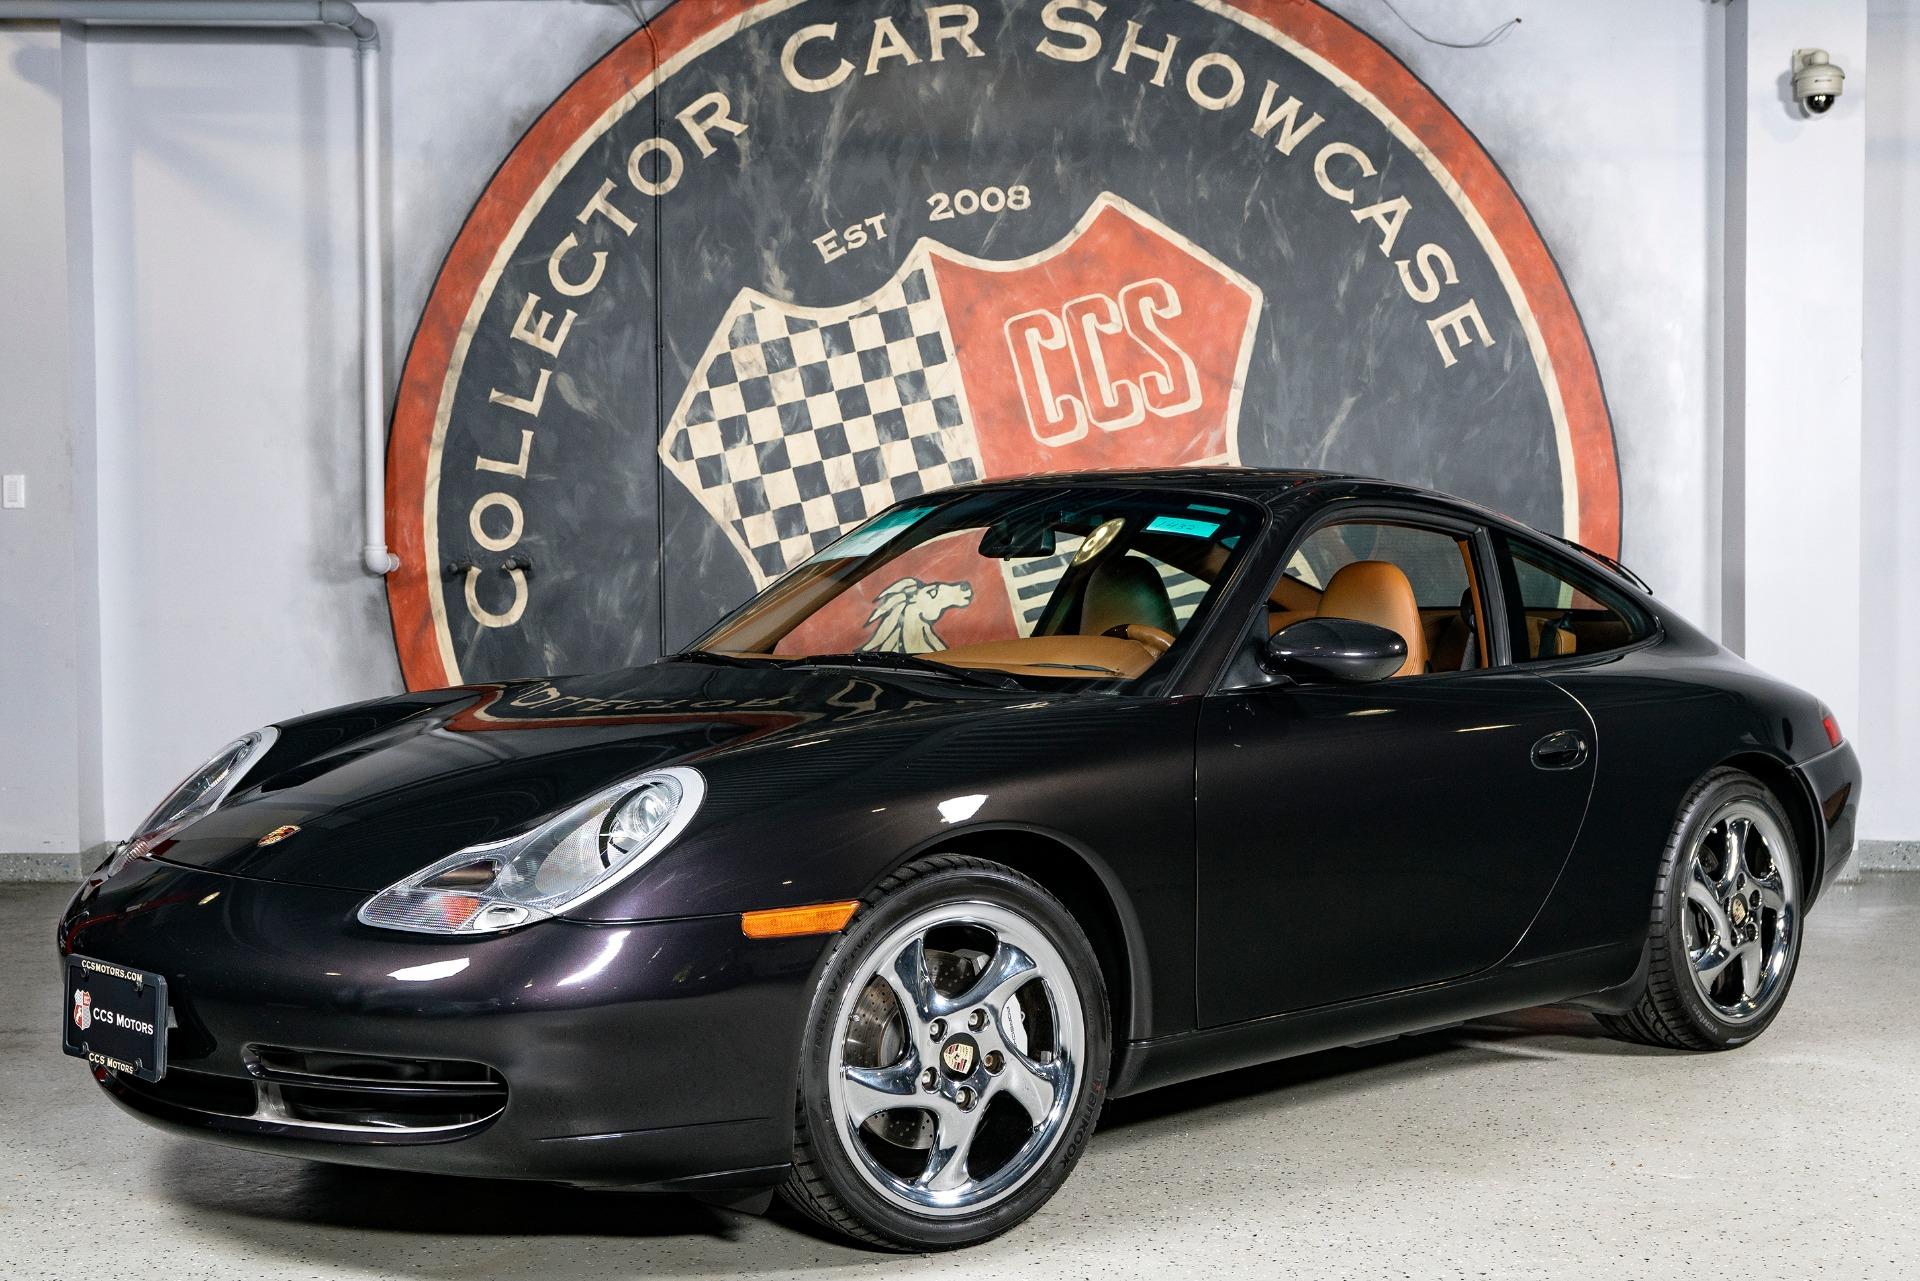 Used 2000 PORSCHE 911 CARRERA 4 MILLENNIUM EDITION | Oyster Bay, NY